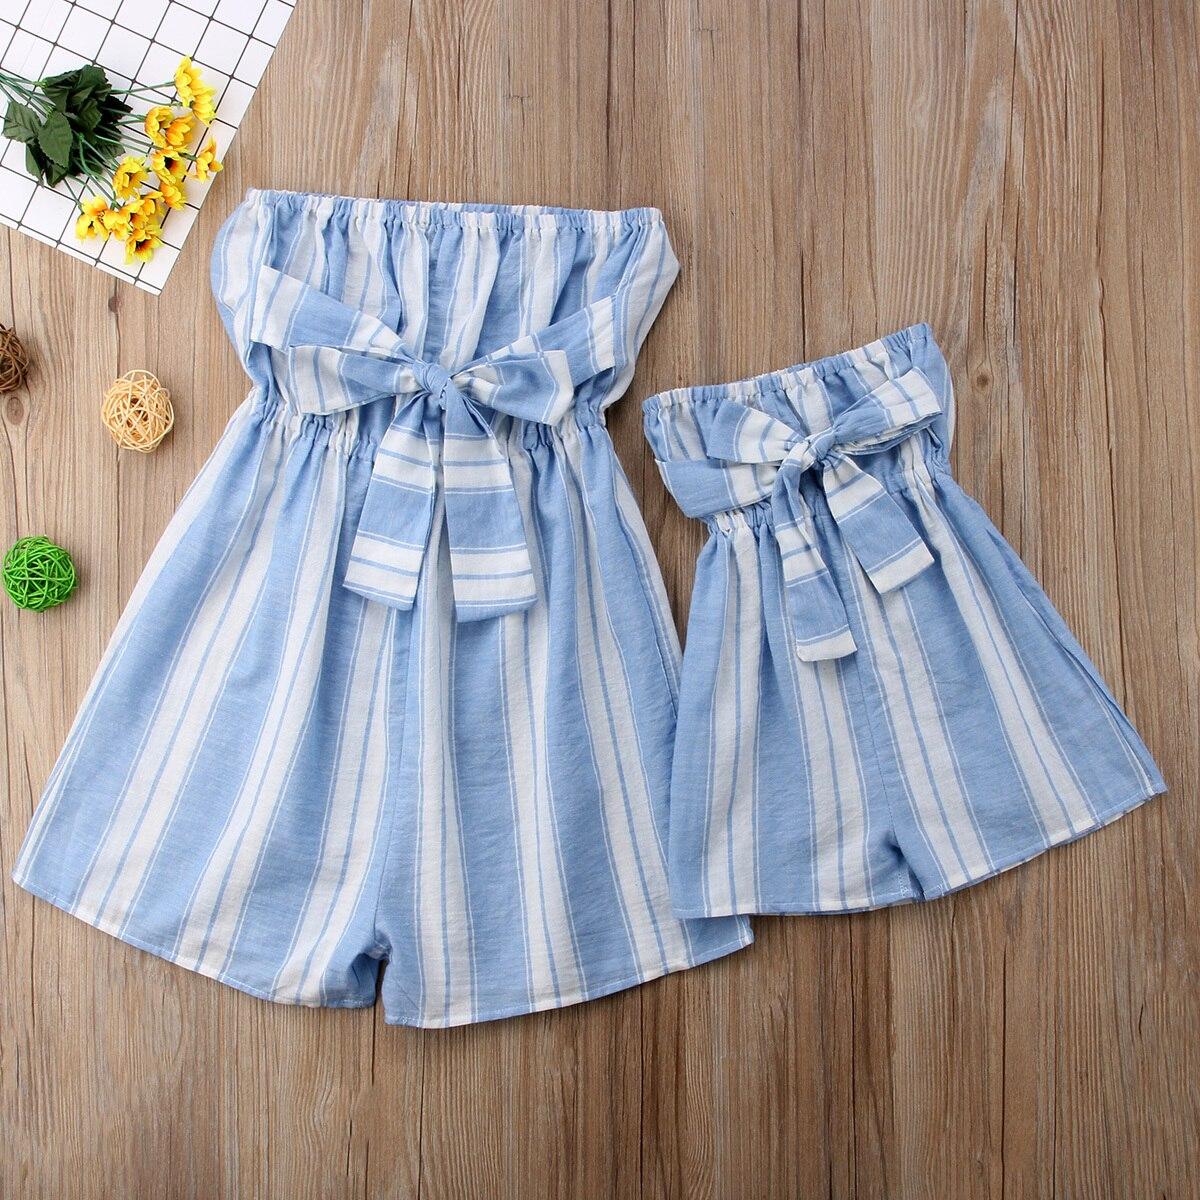 Mother Kids Women Toddler Girl Bowknot Stripe Romper Jumpsuit Jumpsuit Vertical Stripes Sleeveless Summer Clothes